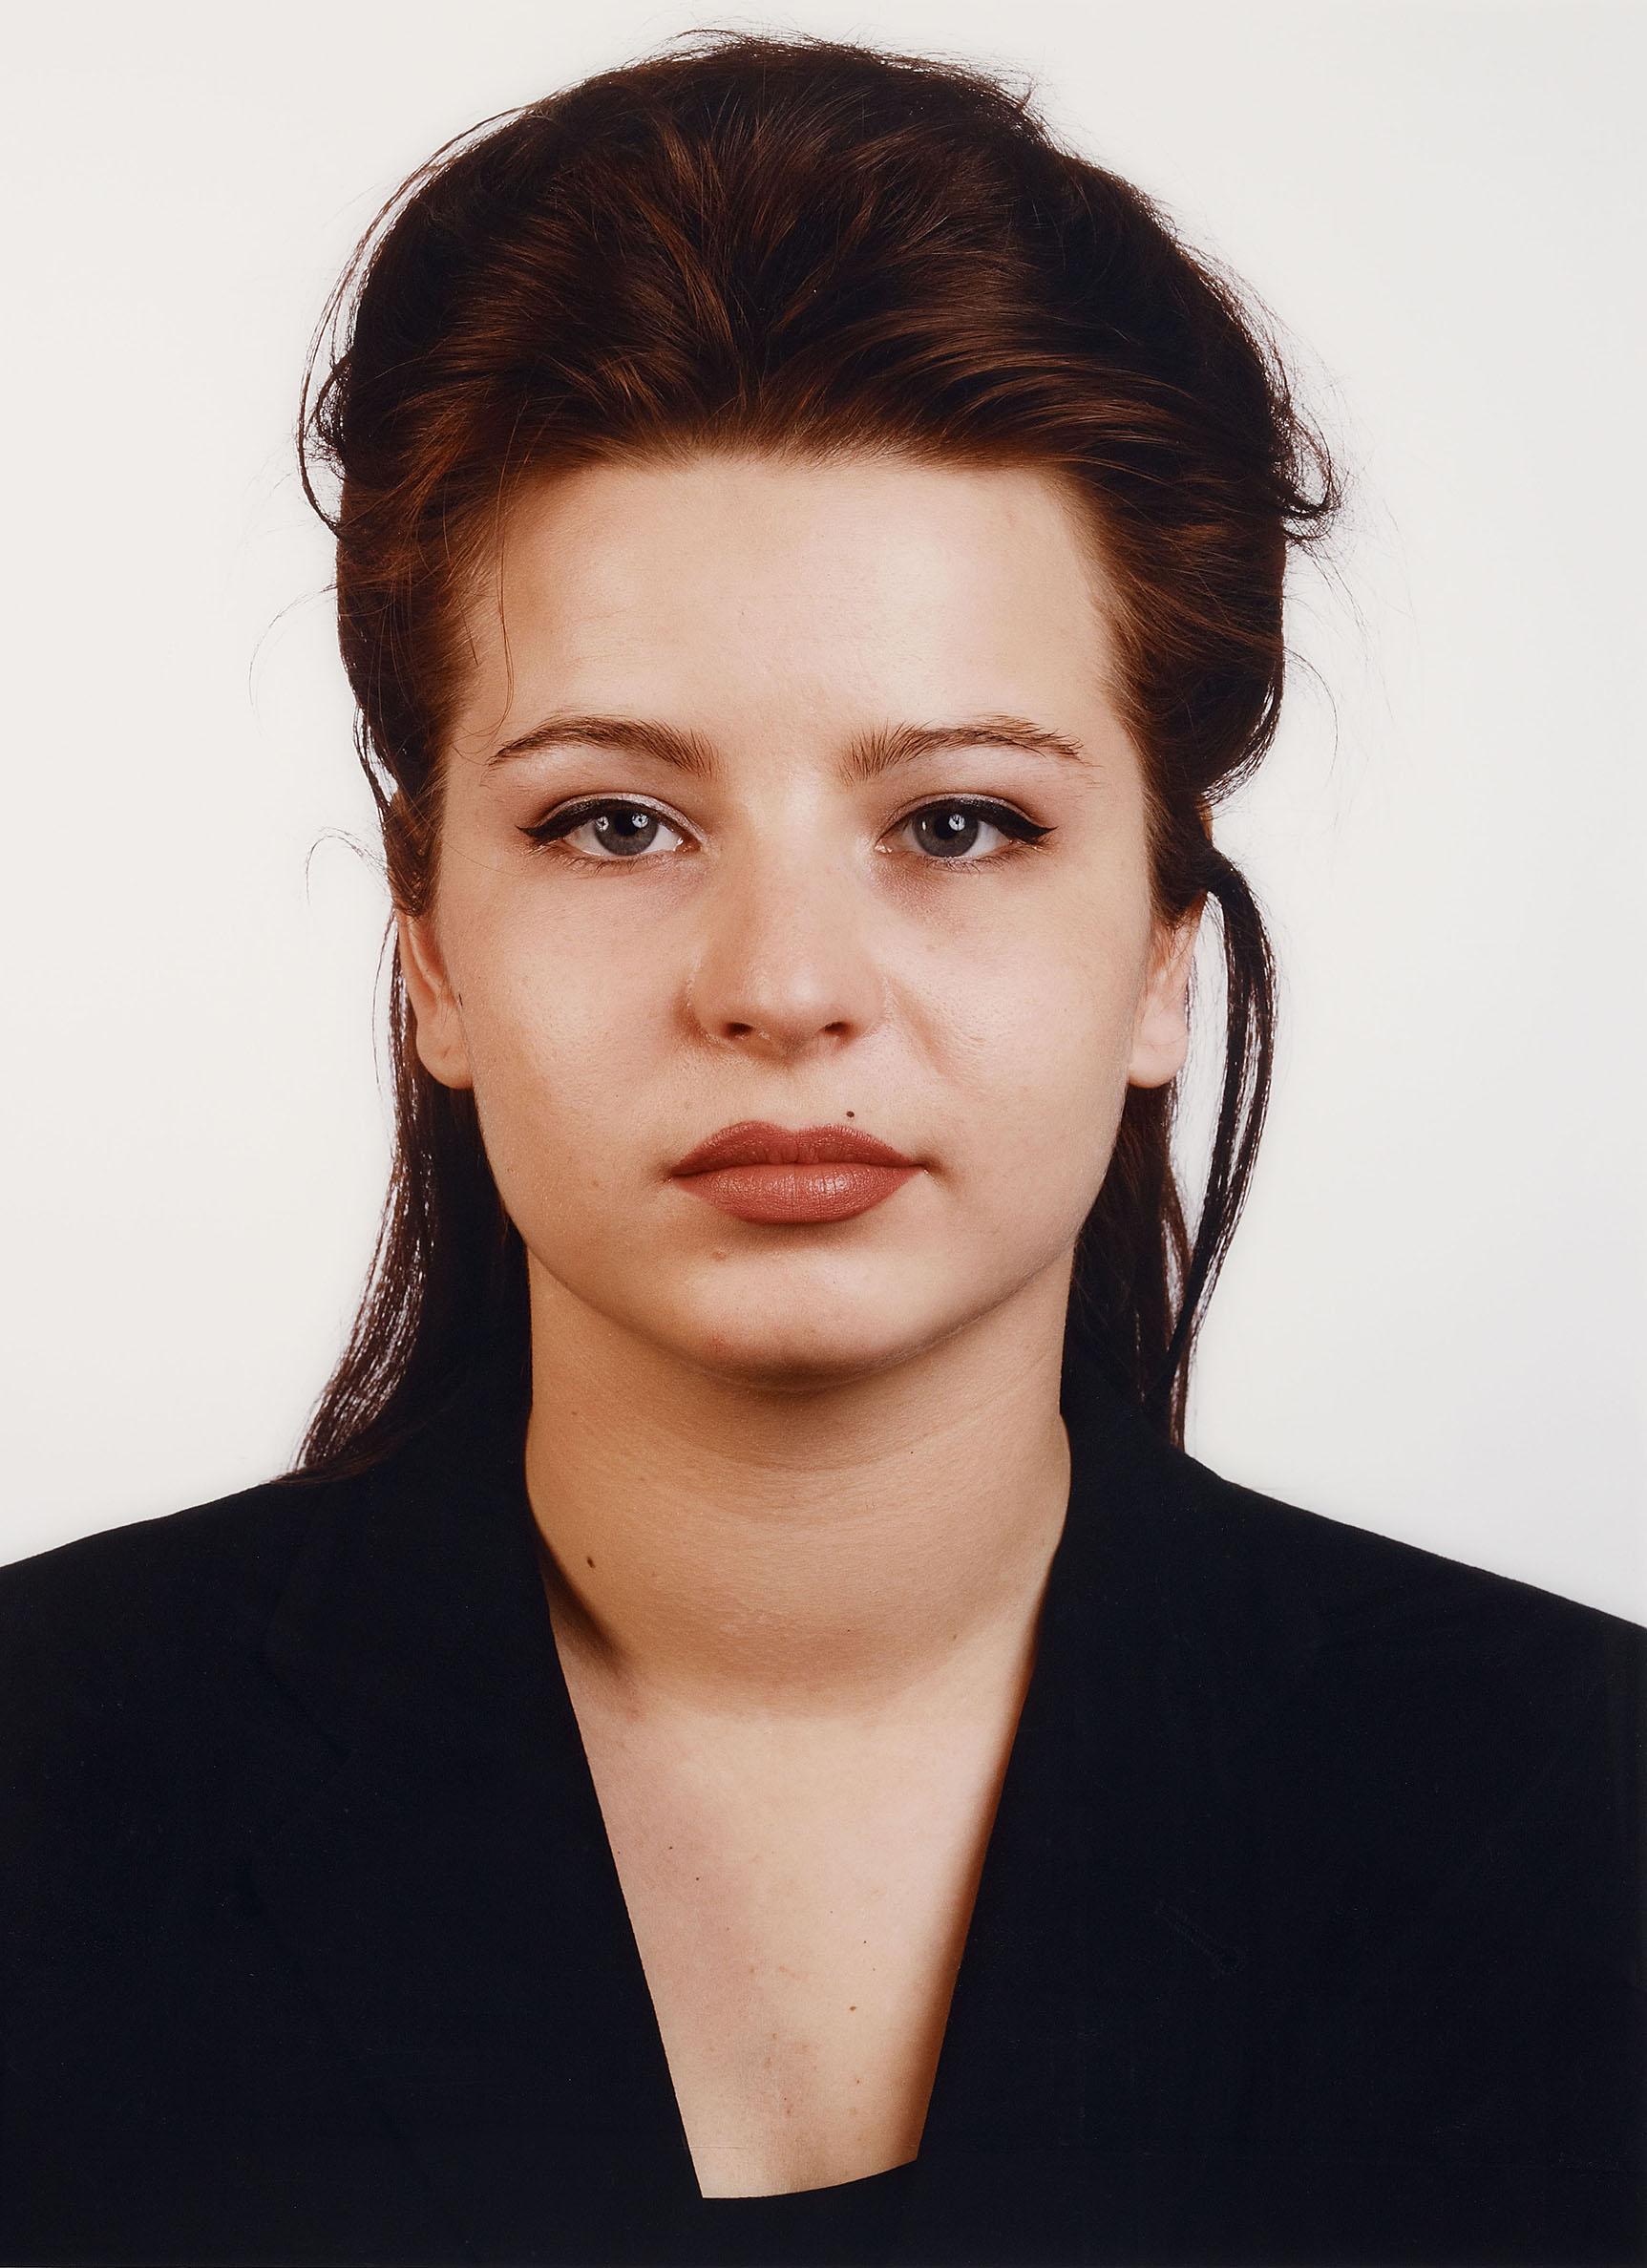 Thomas Ruff, Portrait (J. Renzel), 1988. Chromogenic print, face-mounted to plexiglass, 159.5 x 120.2 cm, Estimate € 25,000 – 30,000